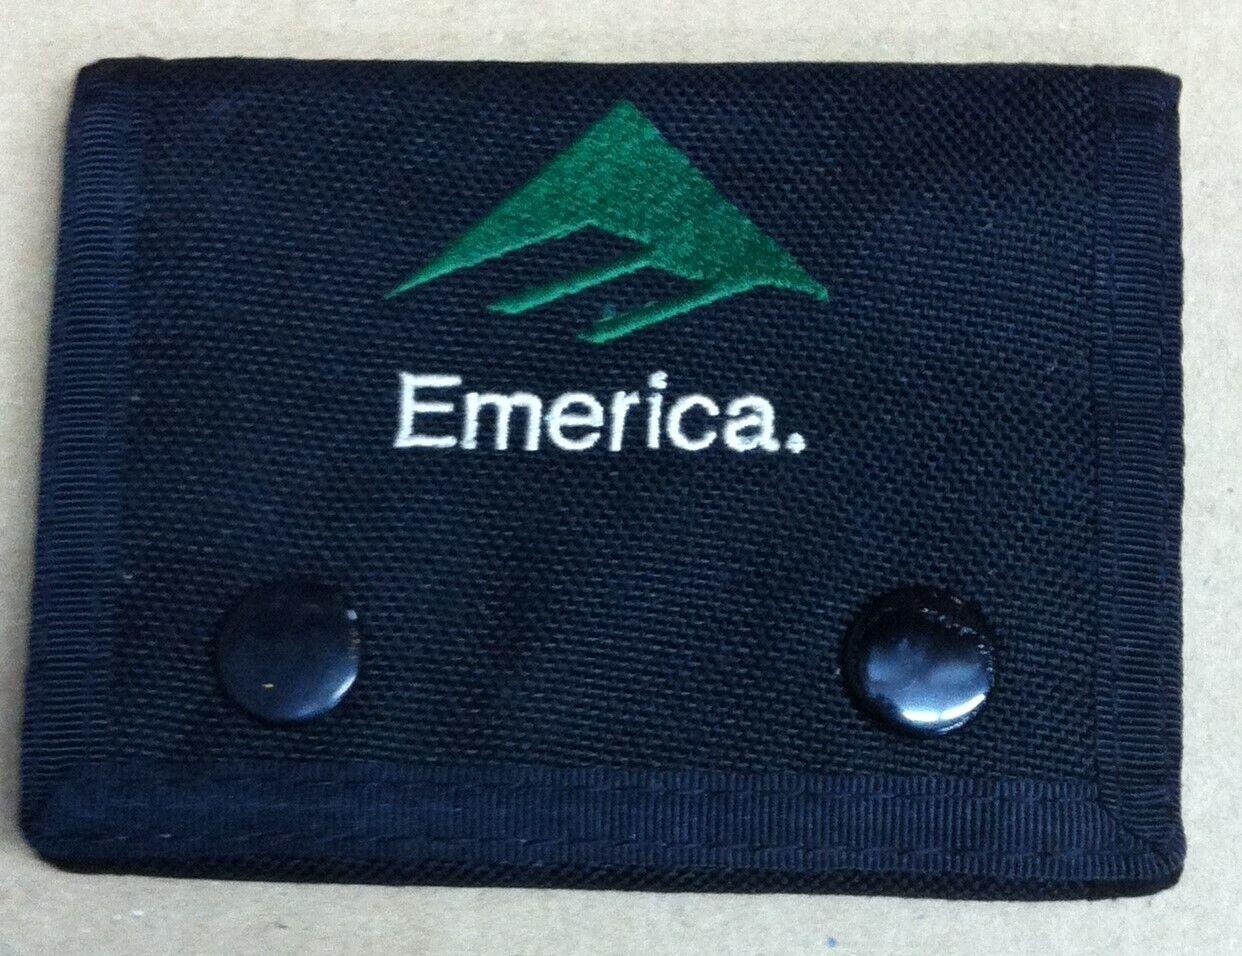 Vintage 90's Emerica skateboard hardcore grunge punk tri-fold nylon wallet